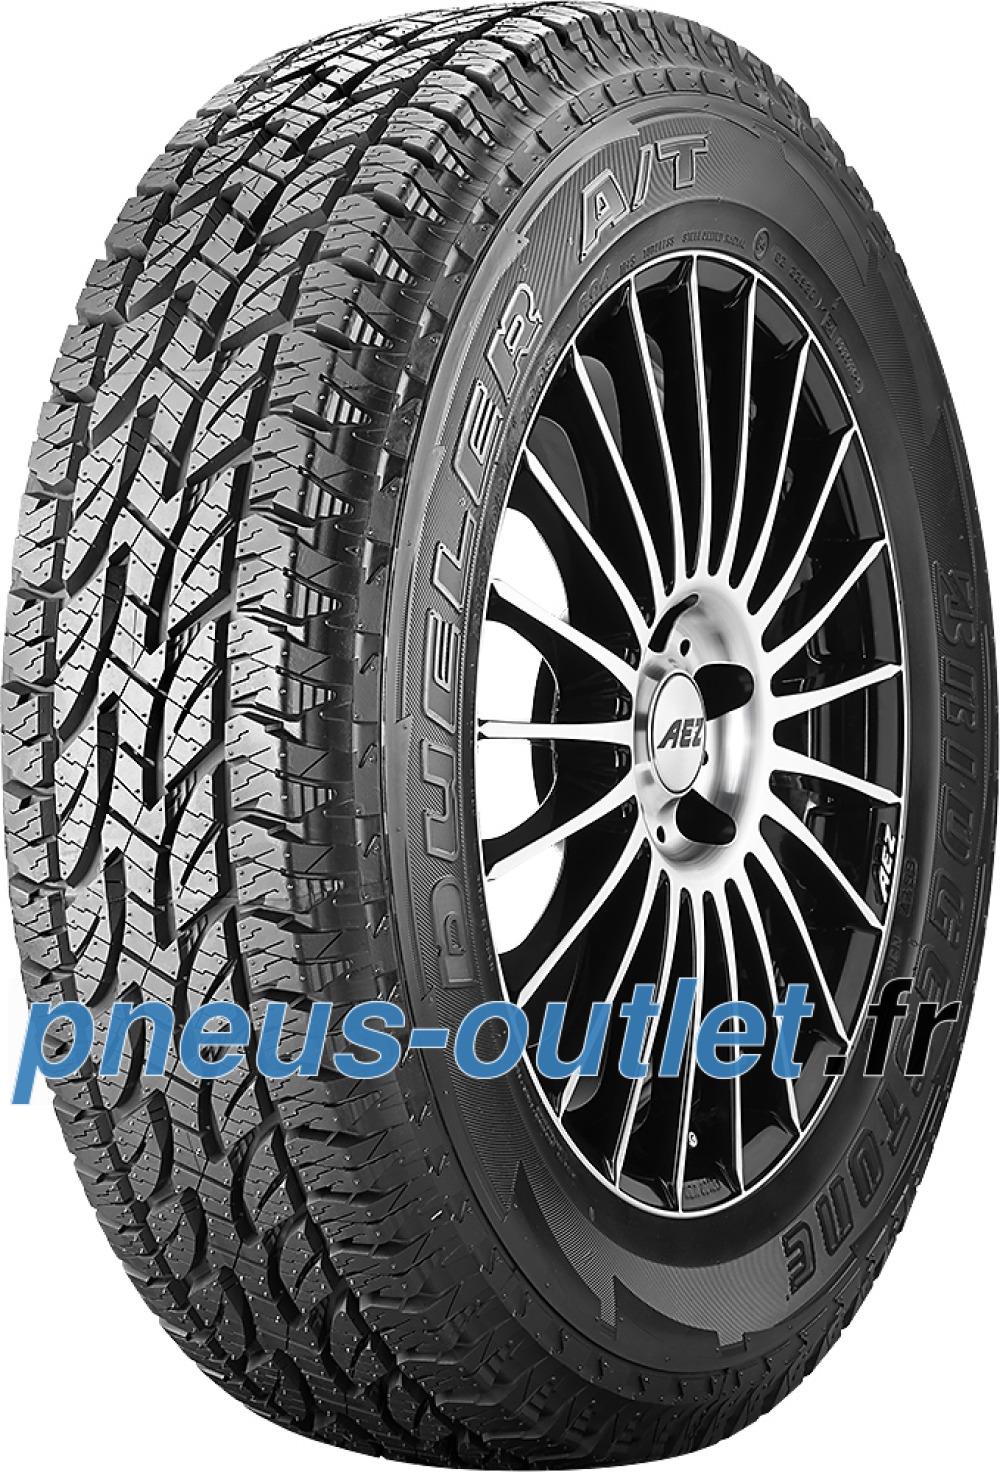 Bridgestone Dueler A/T 694 ( LT225/75 R16 103/100S 6PR , avec protège-jante (MFS) RBL )